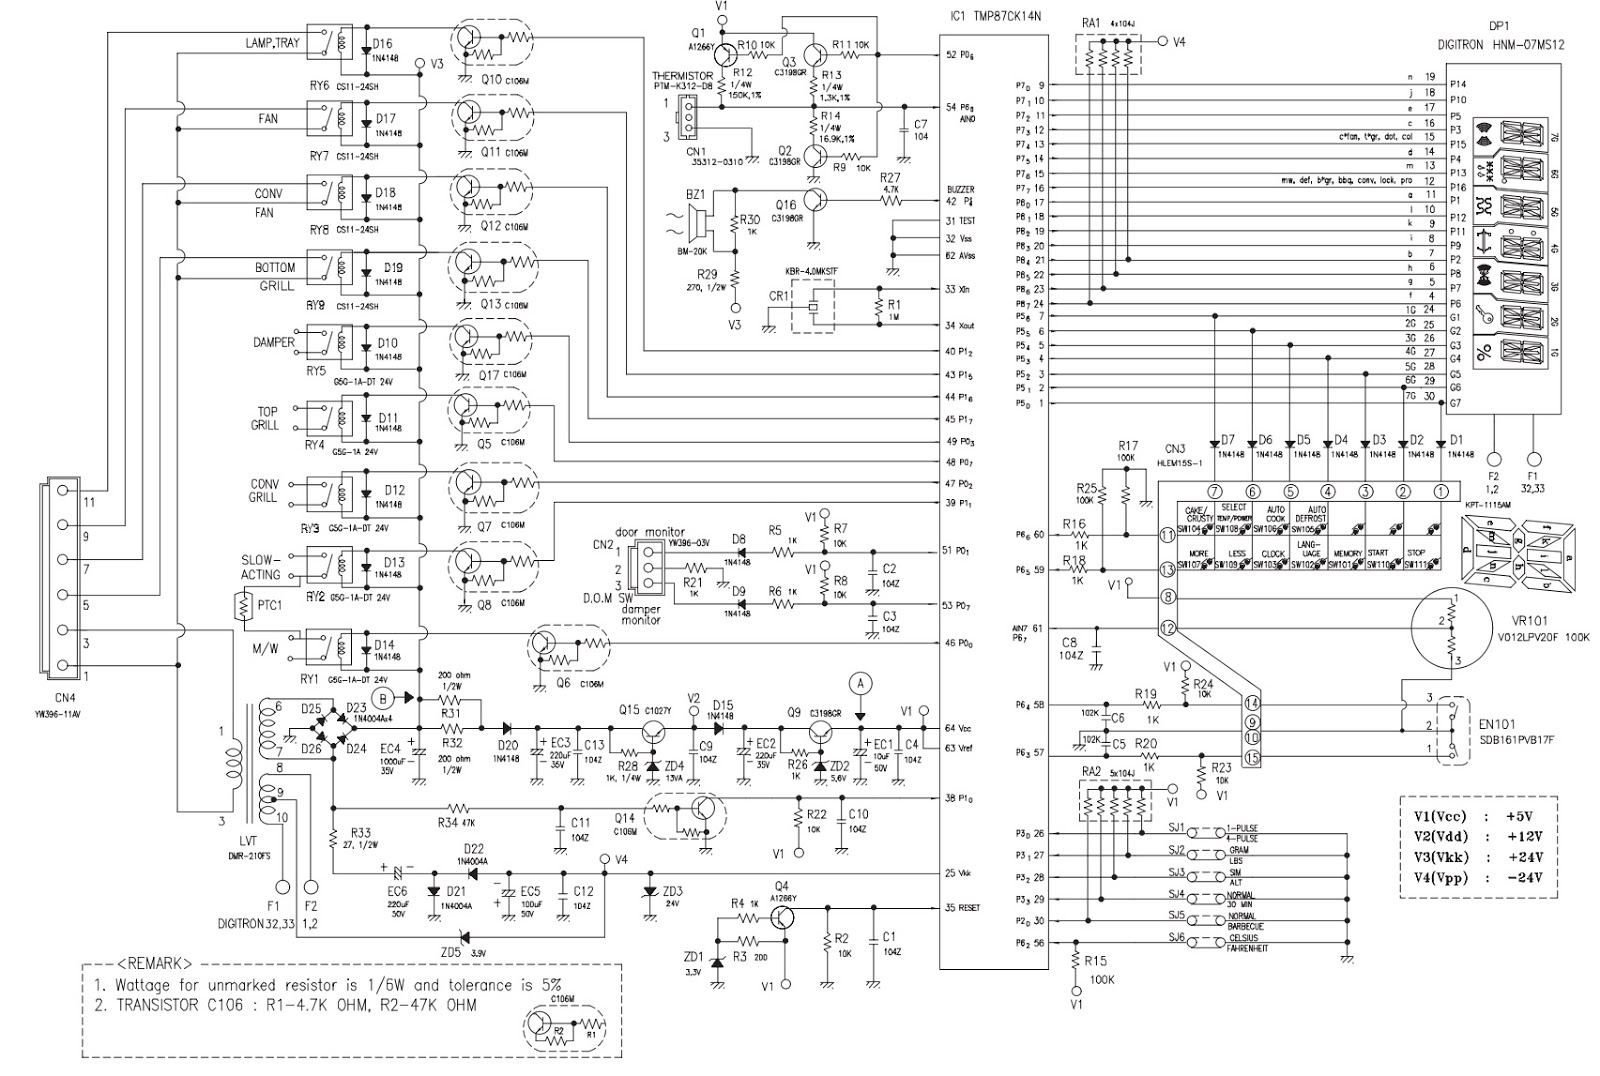 medium resolution of maytag microwave wiring diagram basic electronics wiring diagram maytag oven wiring diagram wrg 1374 maytag